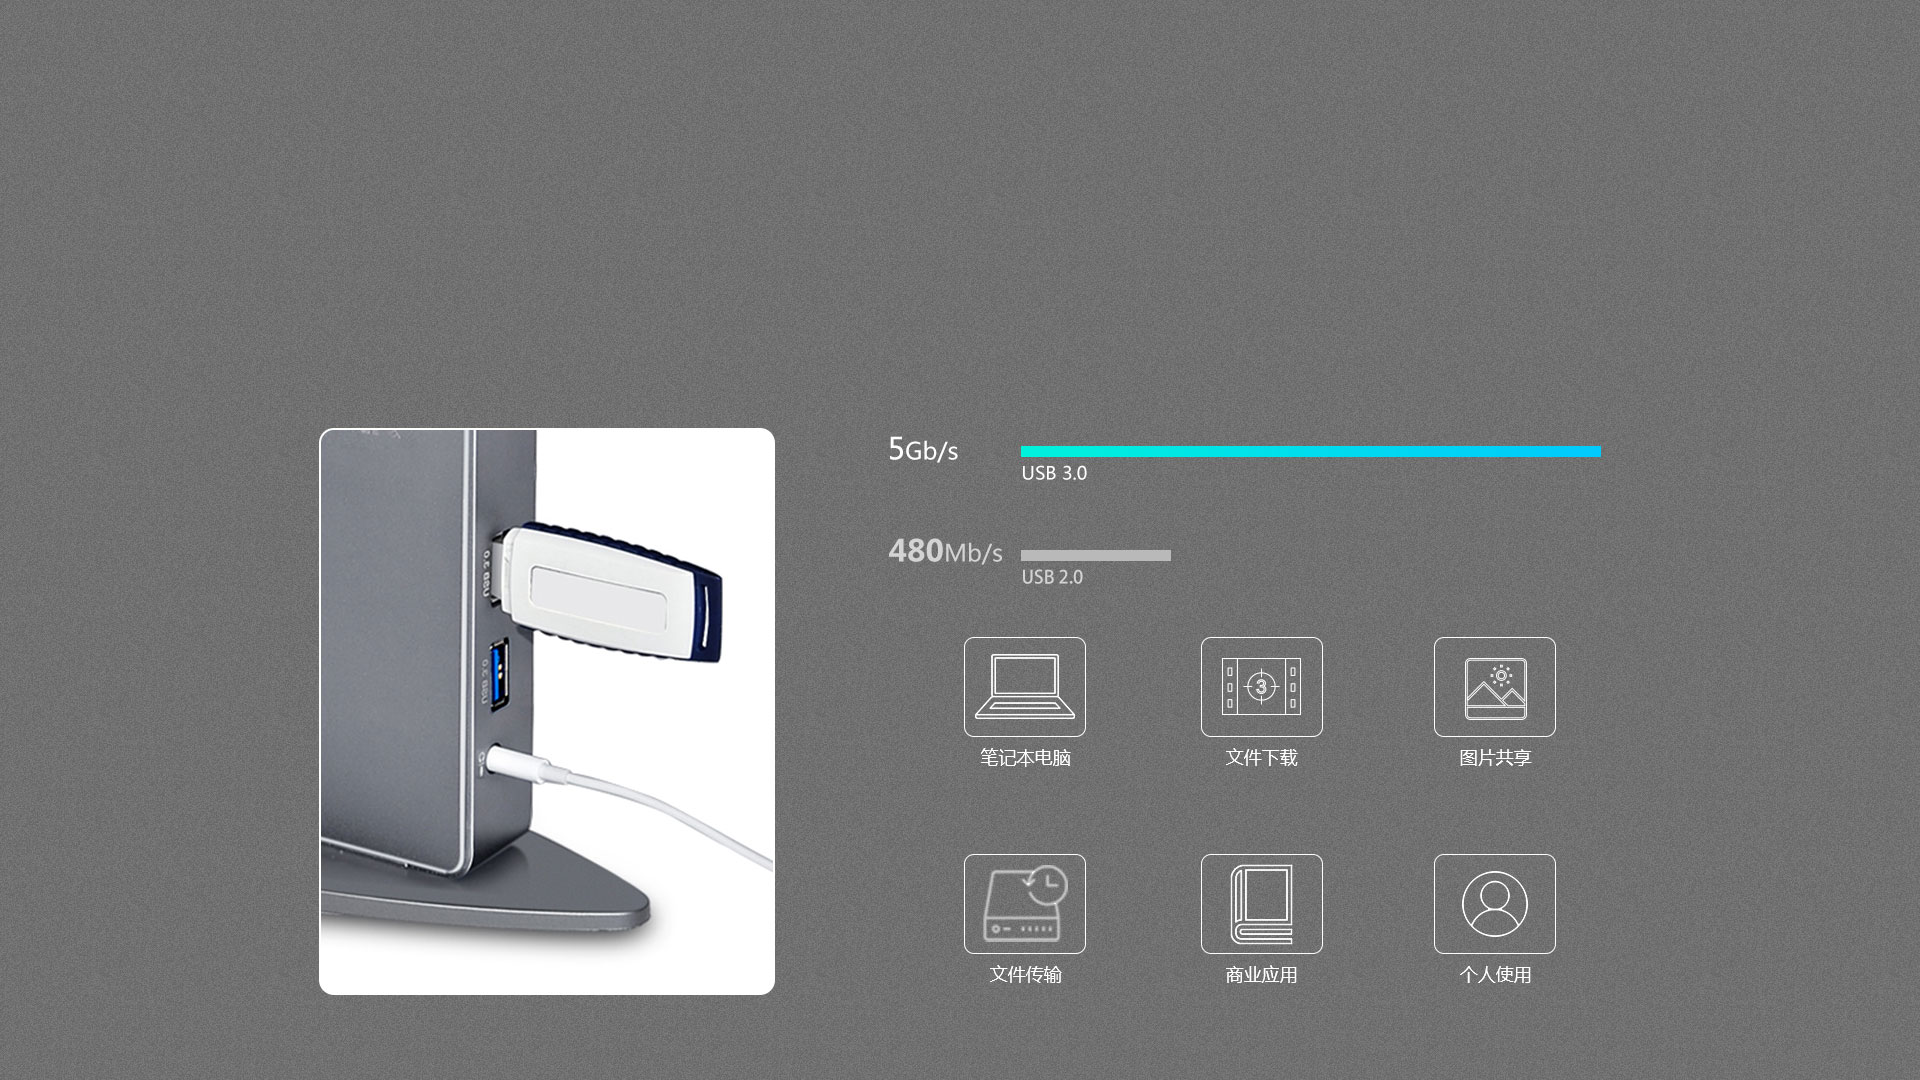 UG39DK7自带四个USB3.0接口